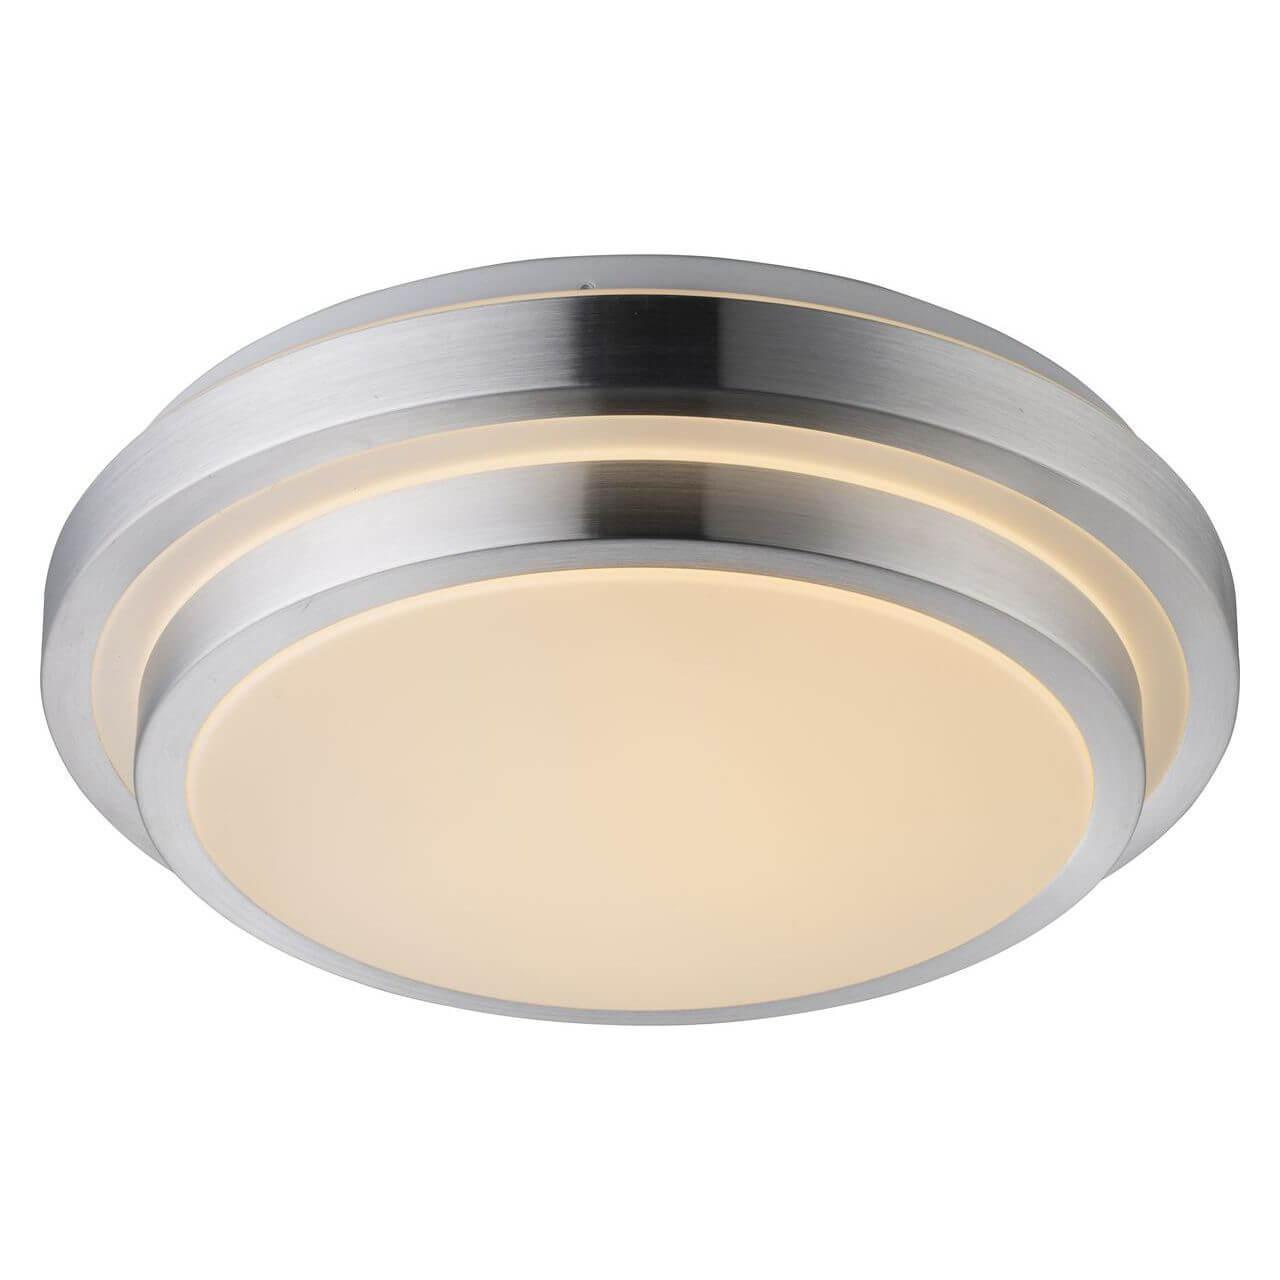 Накладной светильник Globo 41738-24, LED, 24 Вт накладной светильник globo claire 48077